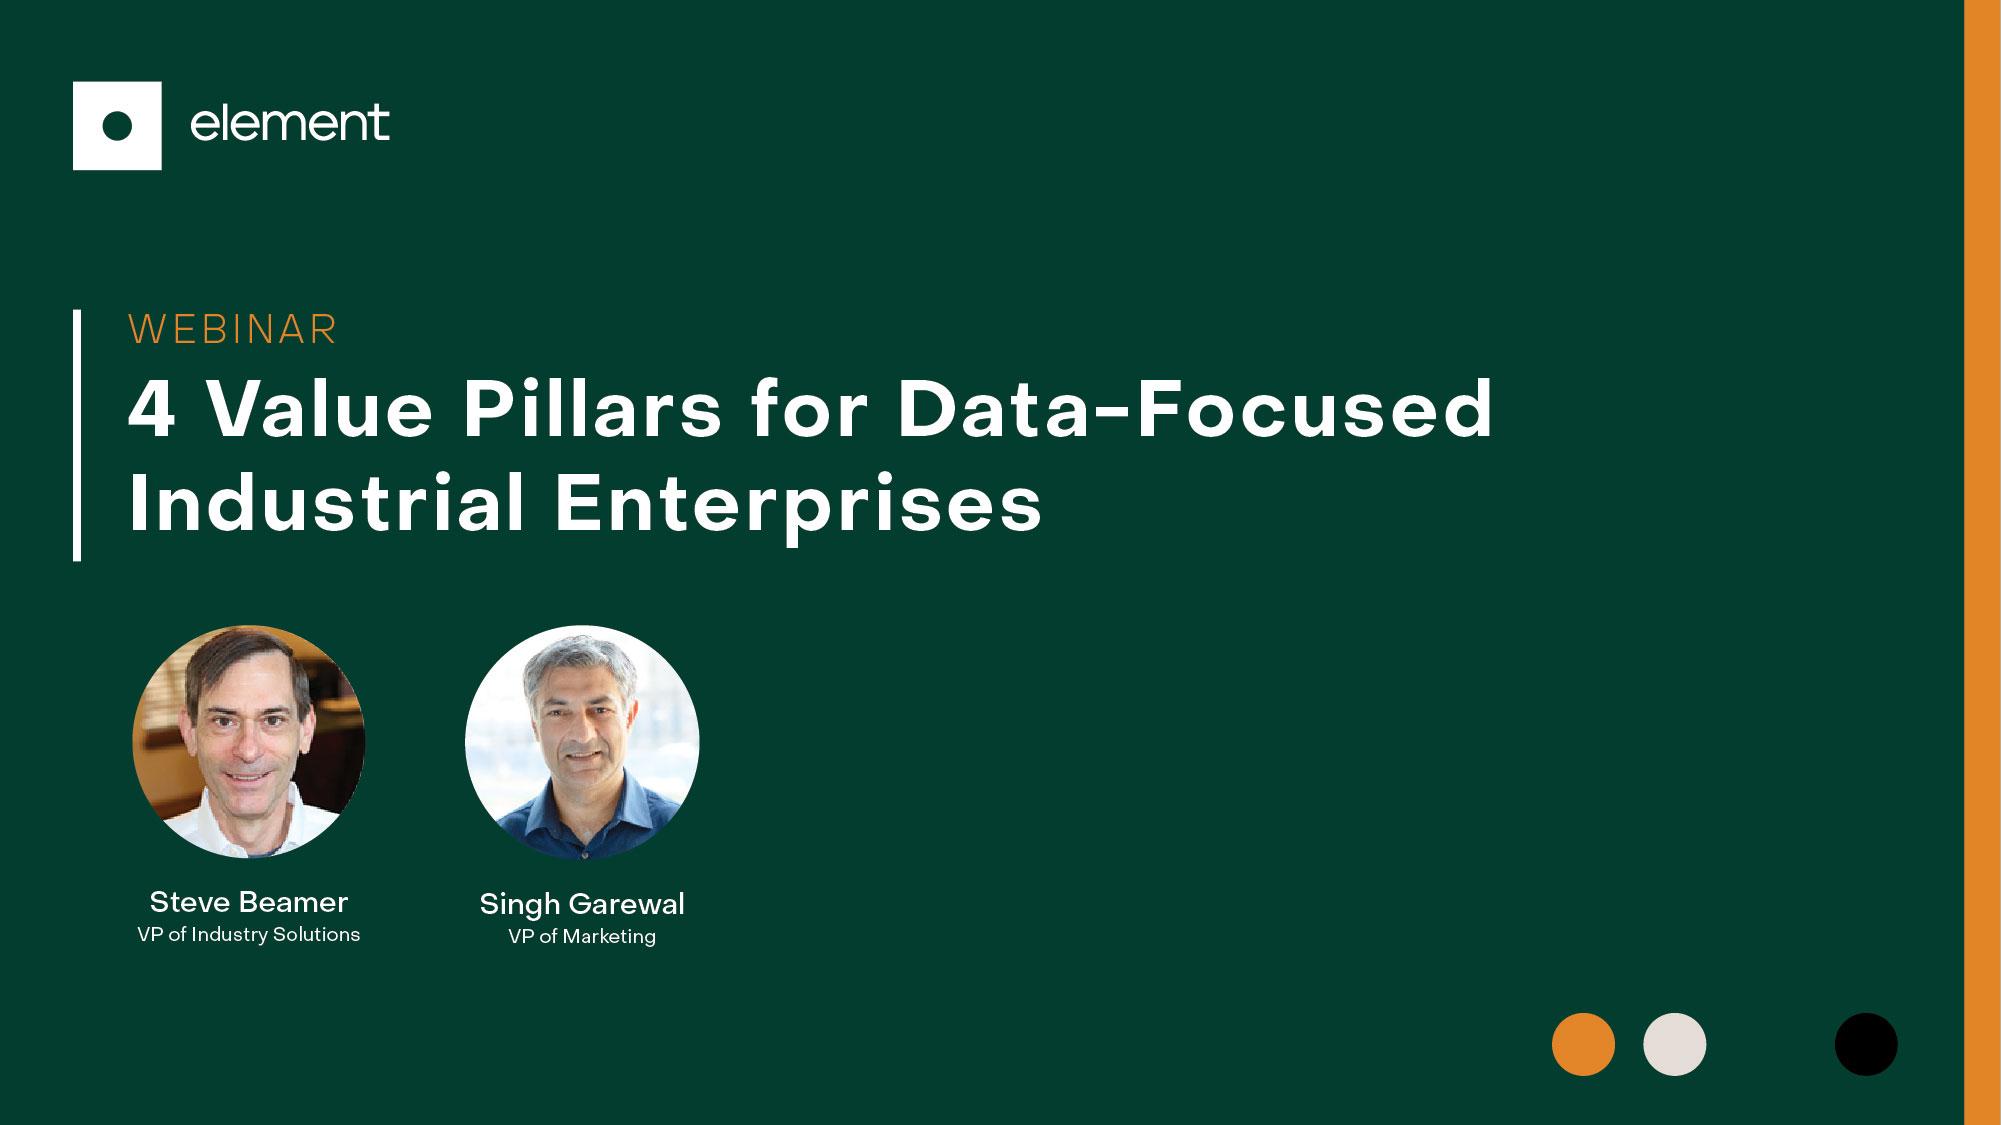 4 Value Pillars for Data-Focused Industrial Enterprises